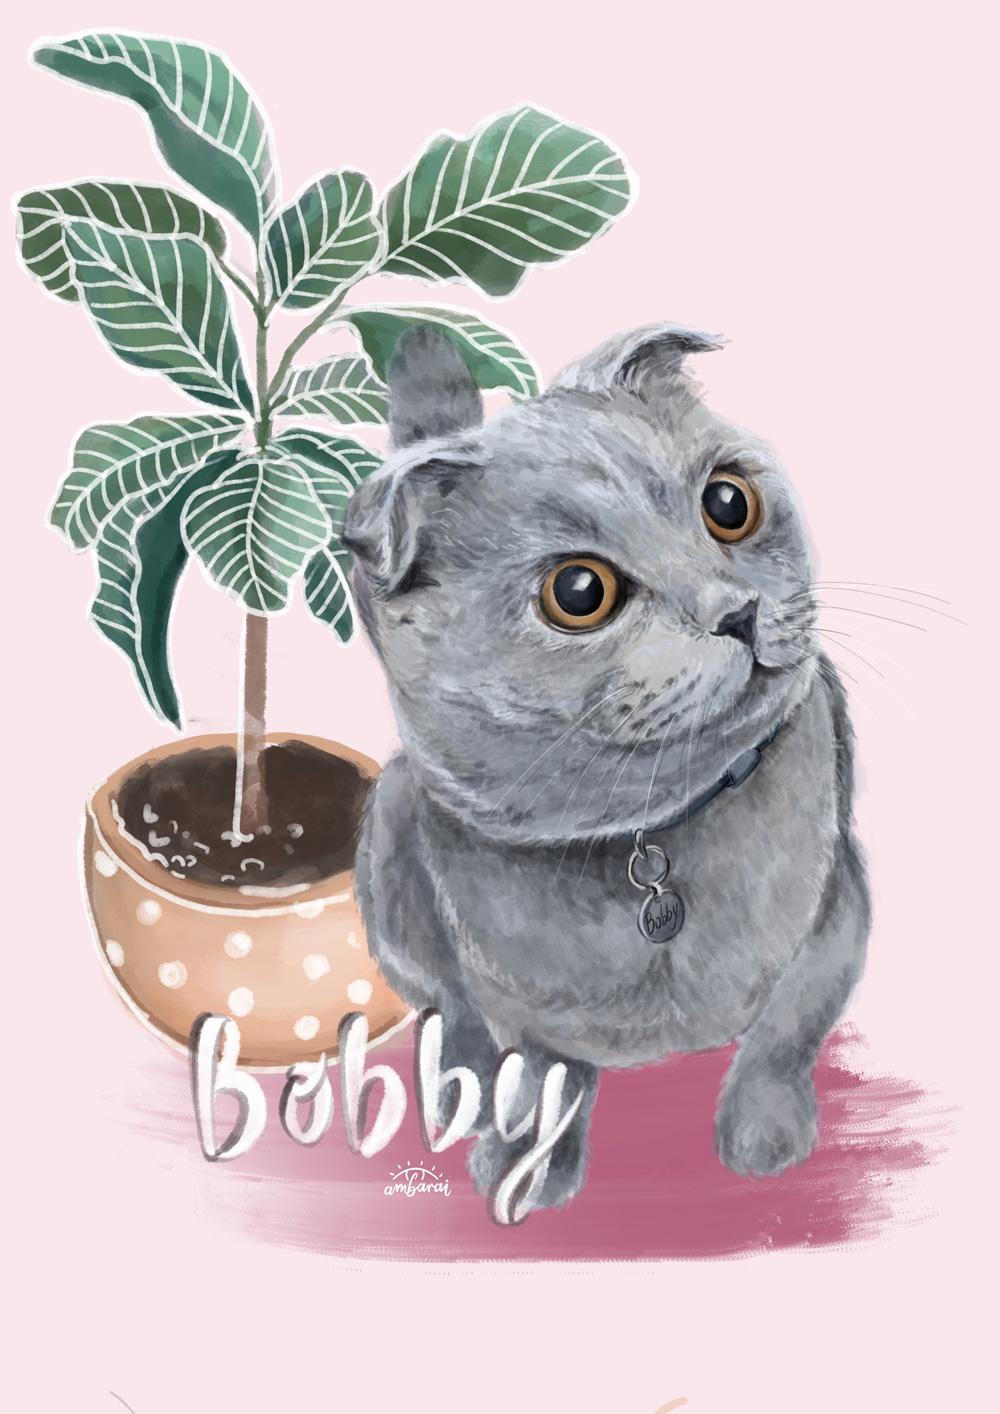 Retratos de mascotas. Retrato del gato Bobby